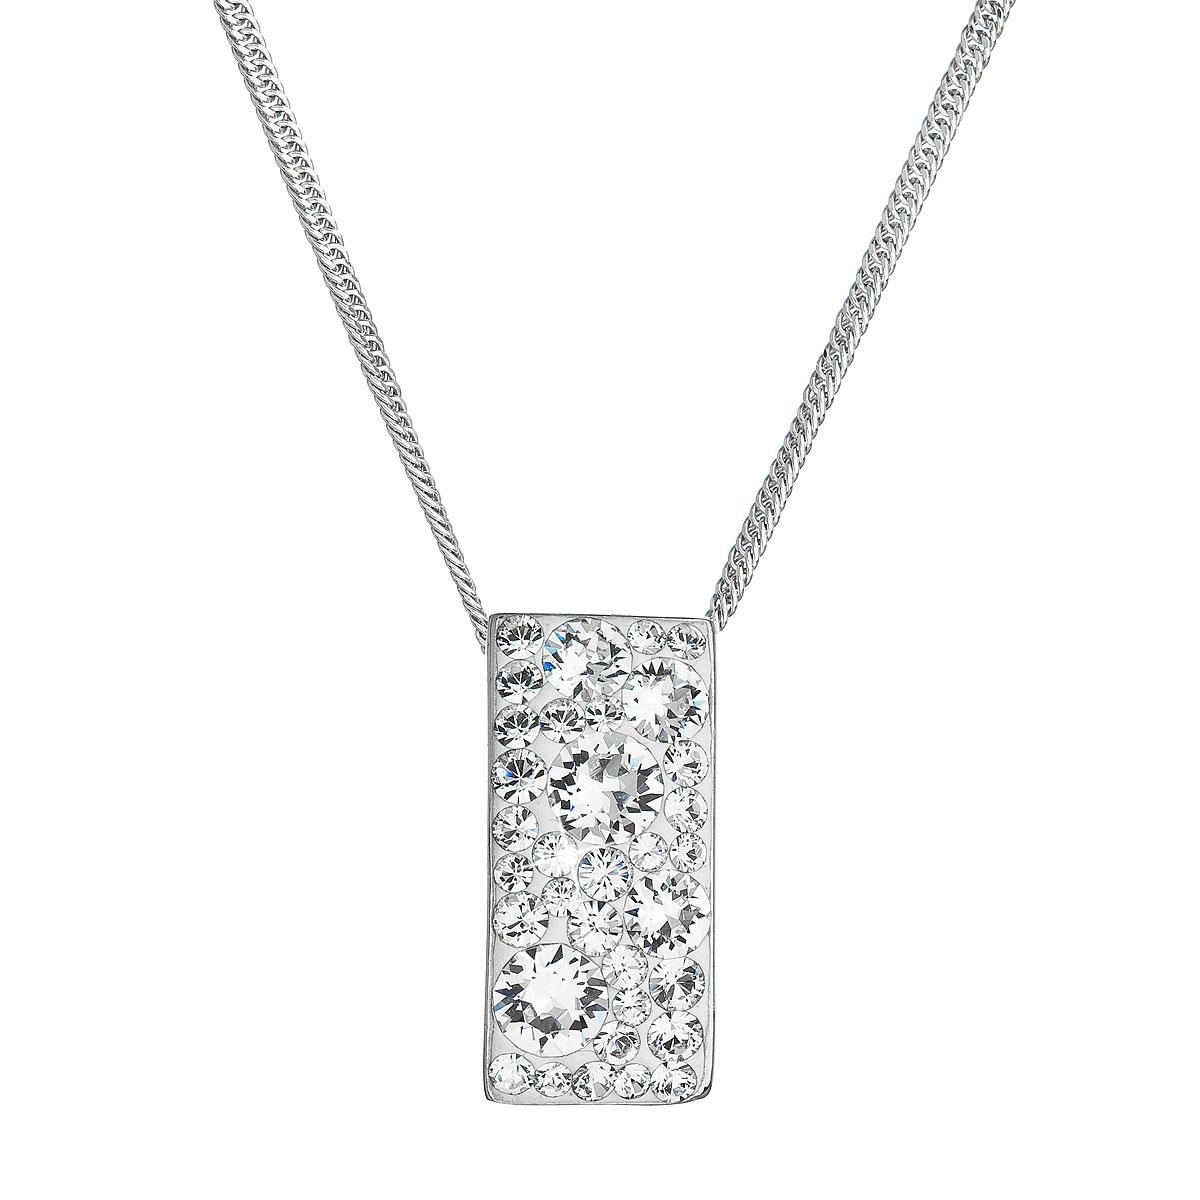 Stříbrný náhrdelník se Swarovski krystaly, Crystal EG4257-CR